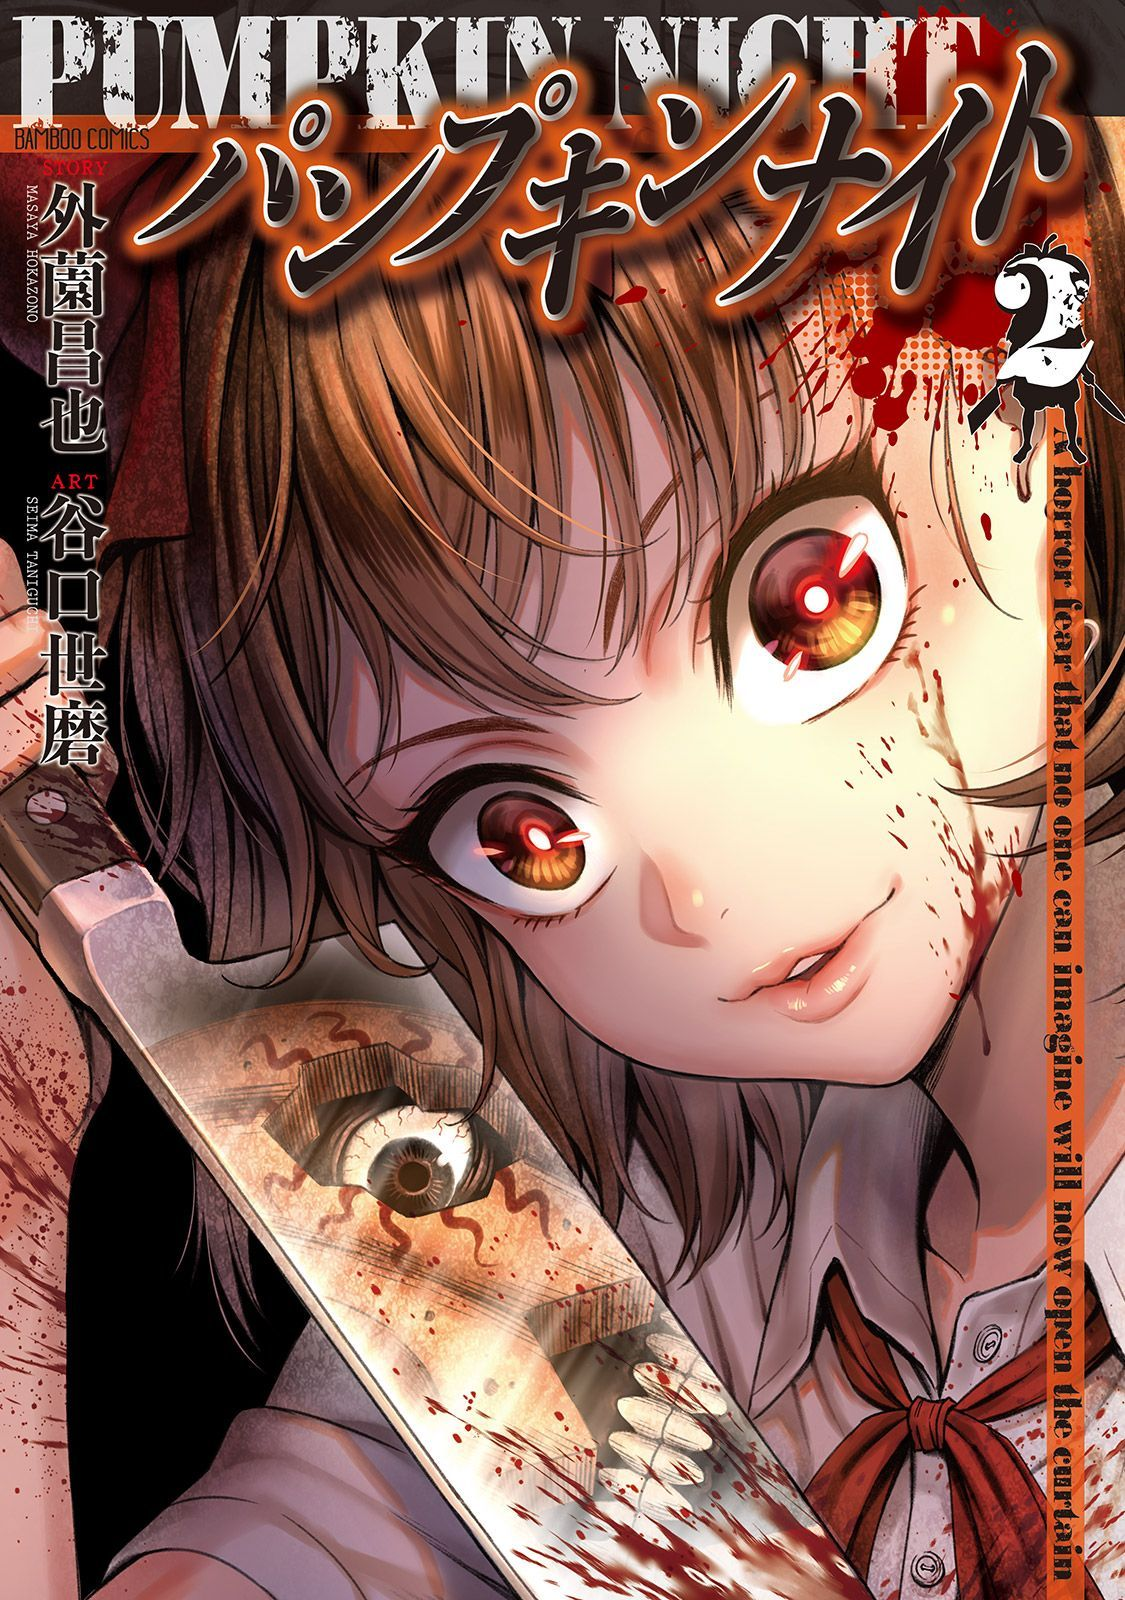 Ghim Của Adham Adam Tren Anime Manga ヽ ノ Anime Viết Kinh Dị